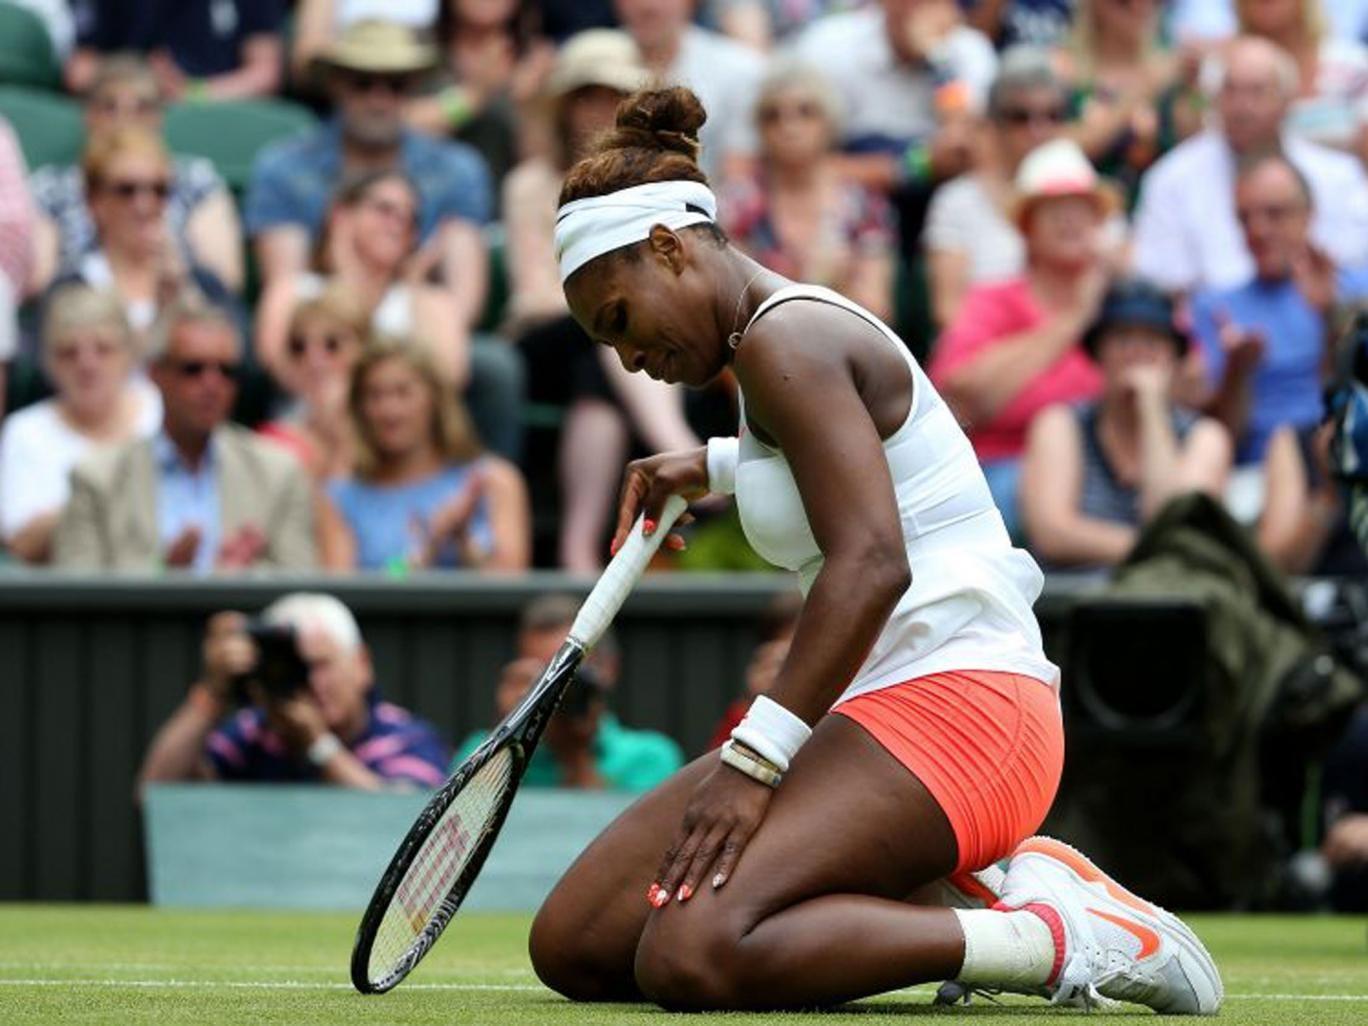 Serena Williams yesterday